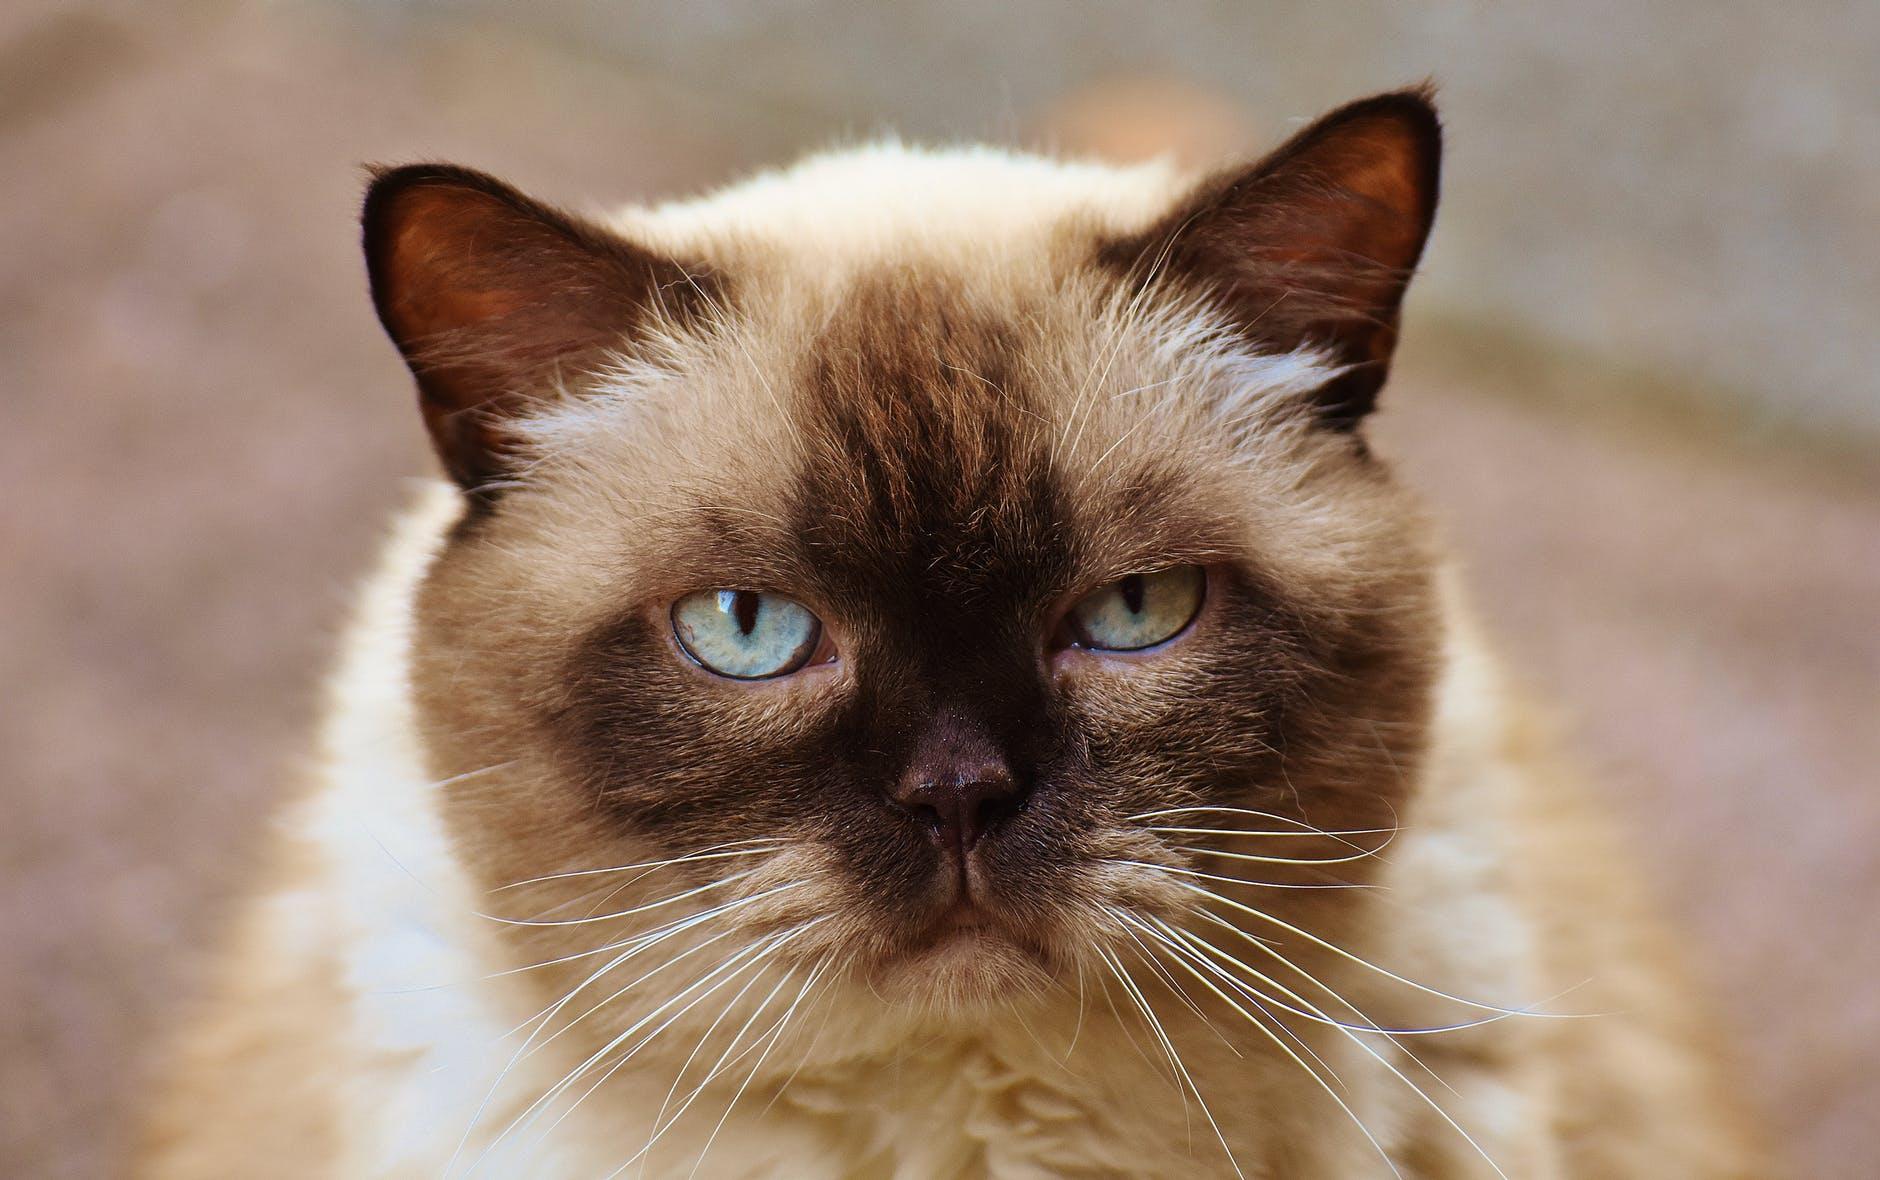 cat-british-shorthair-mieze-blue-eye-162174.jpeg